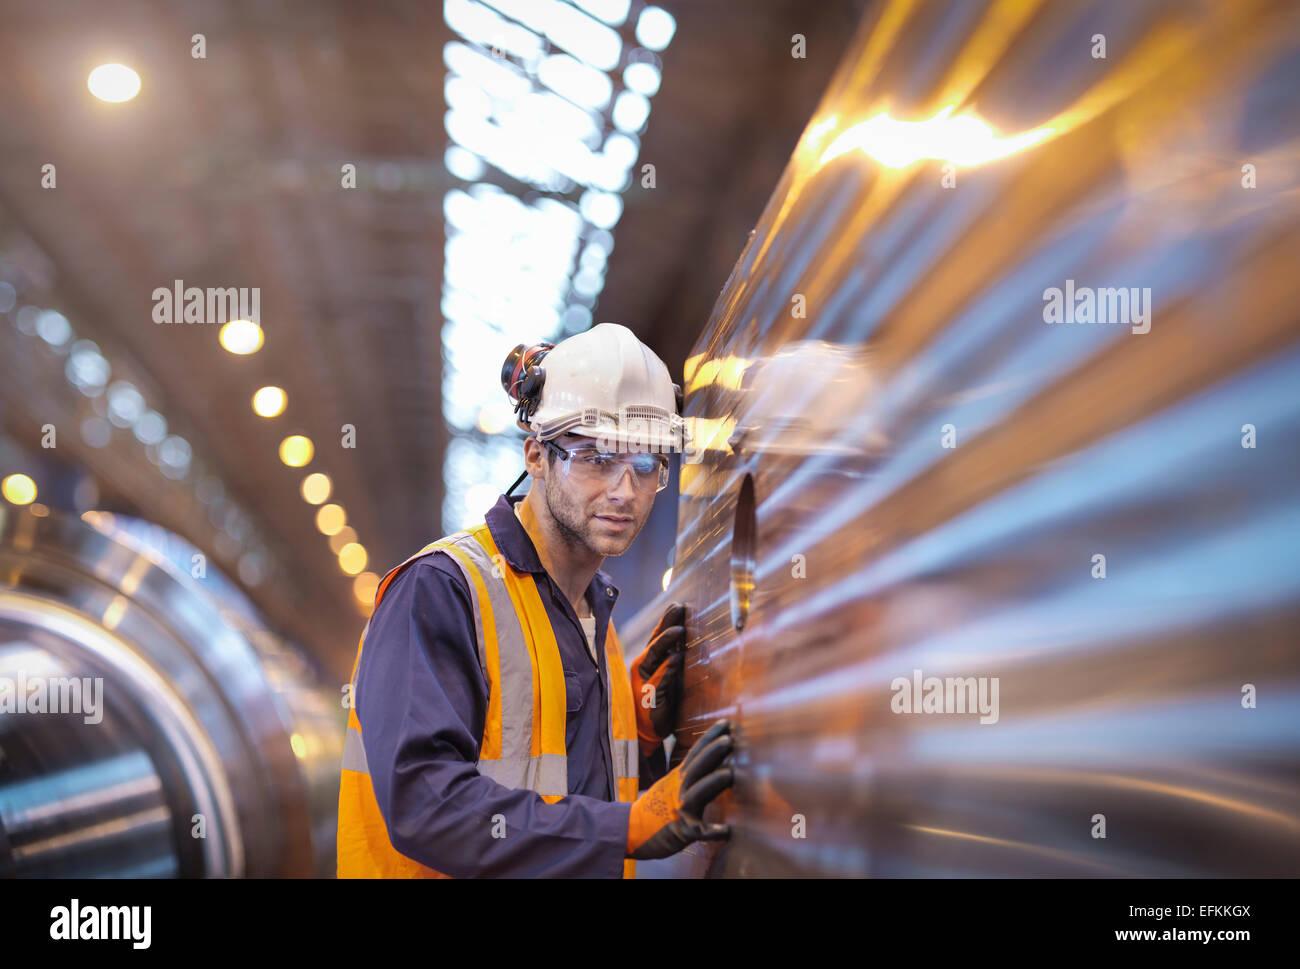 Engineer checking steel part in engineering factory - Stock Image